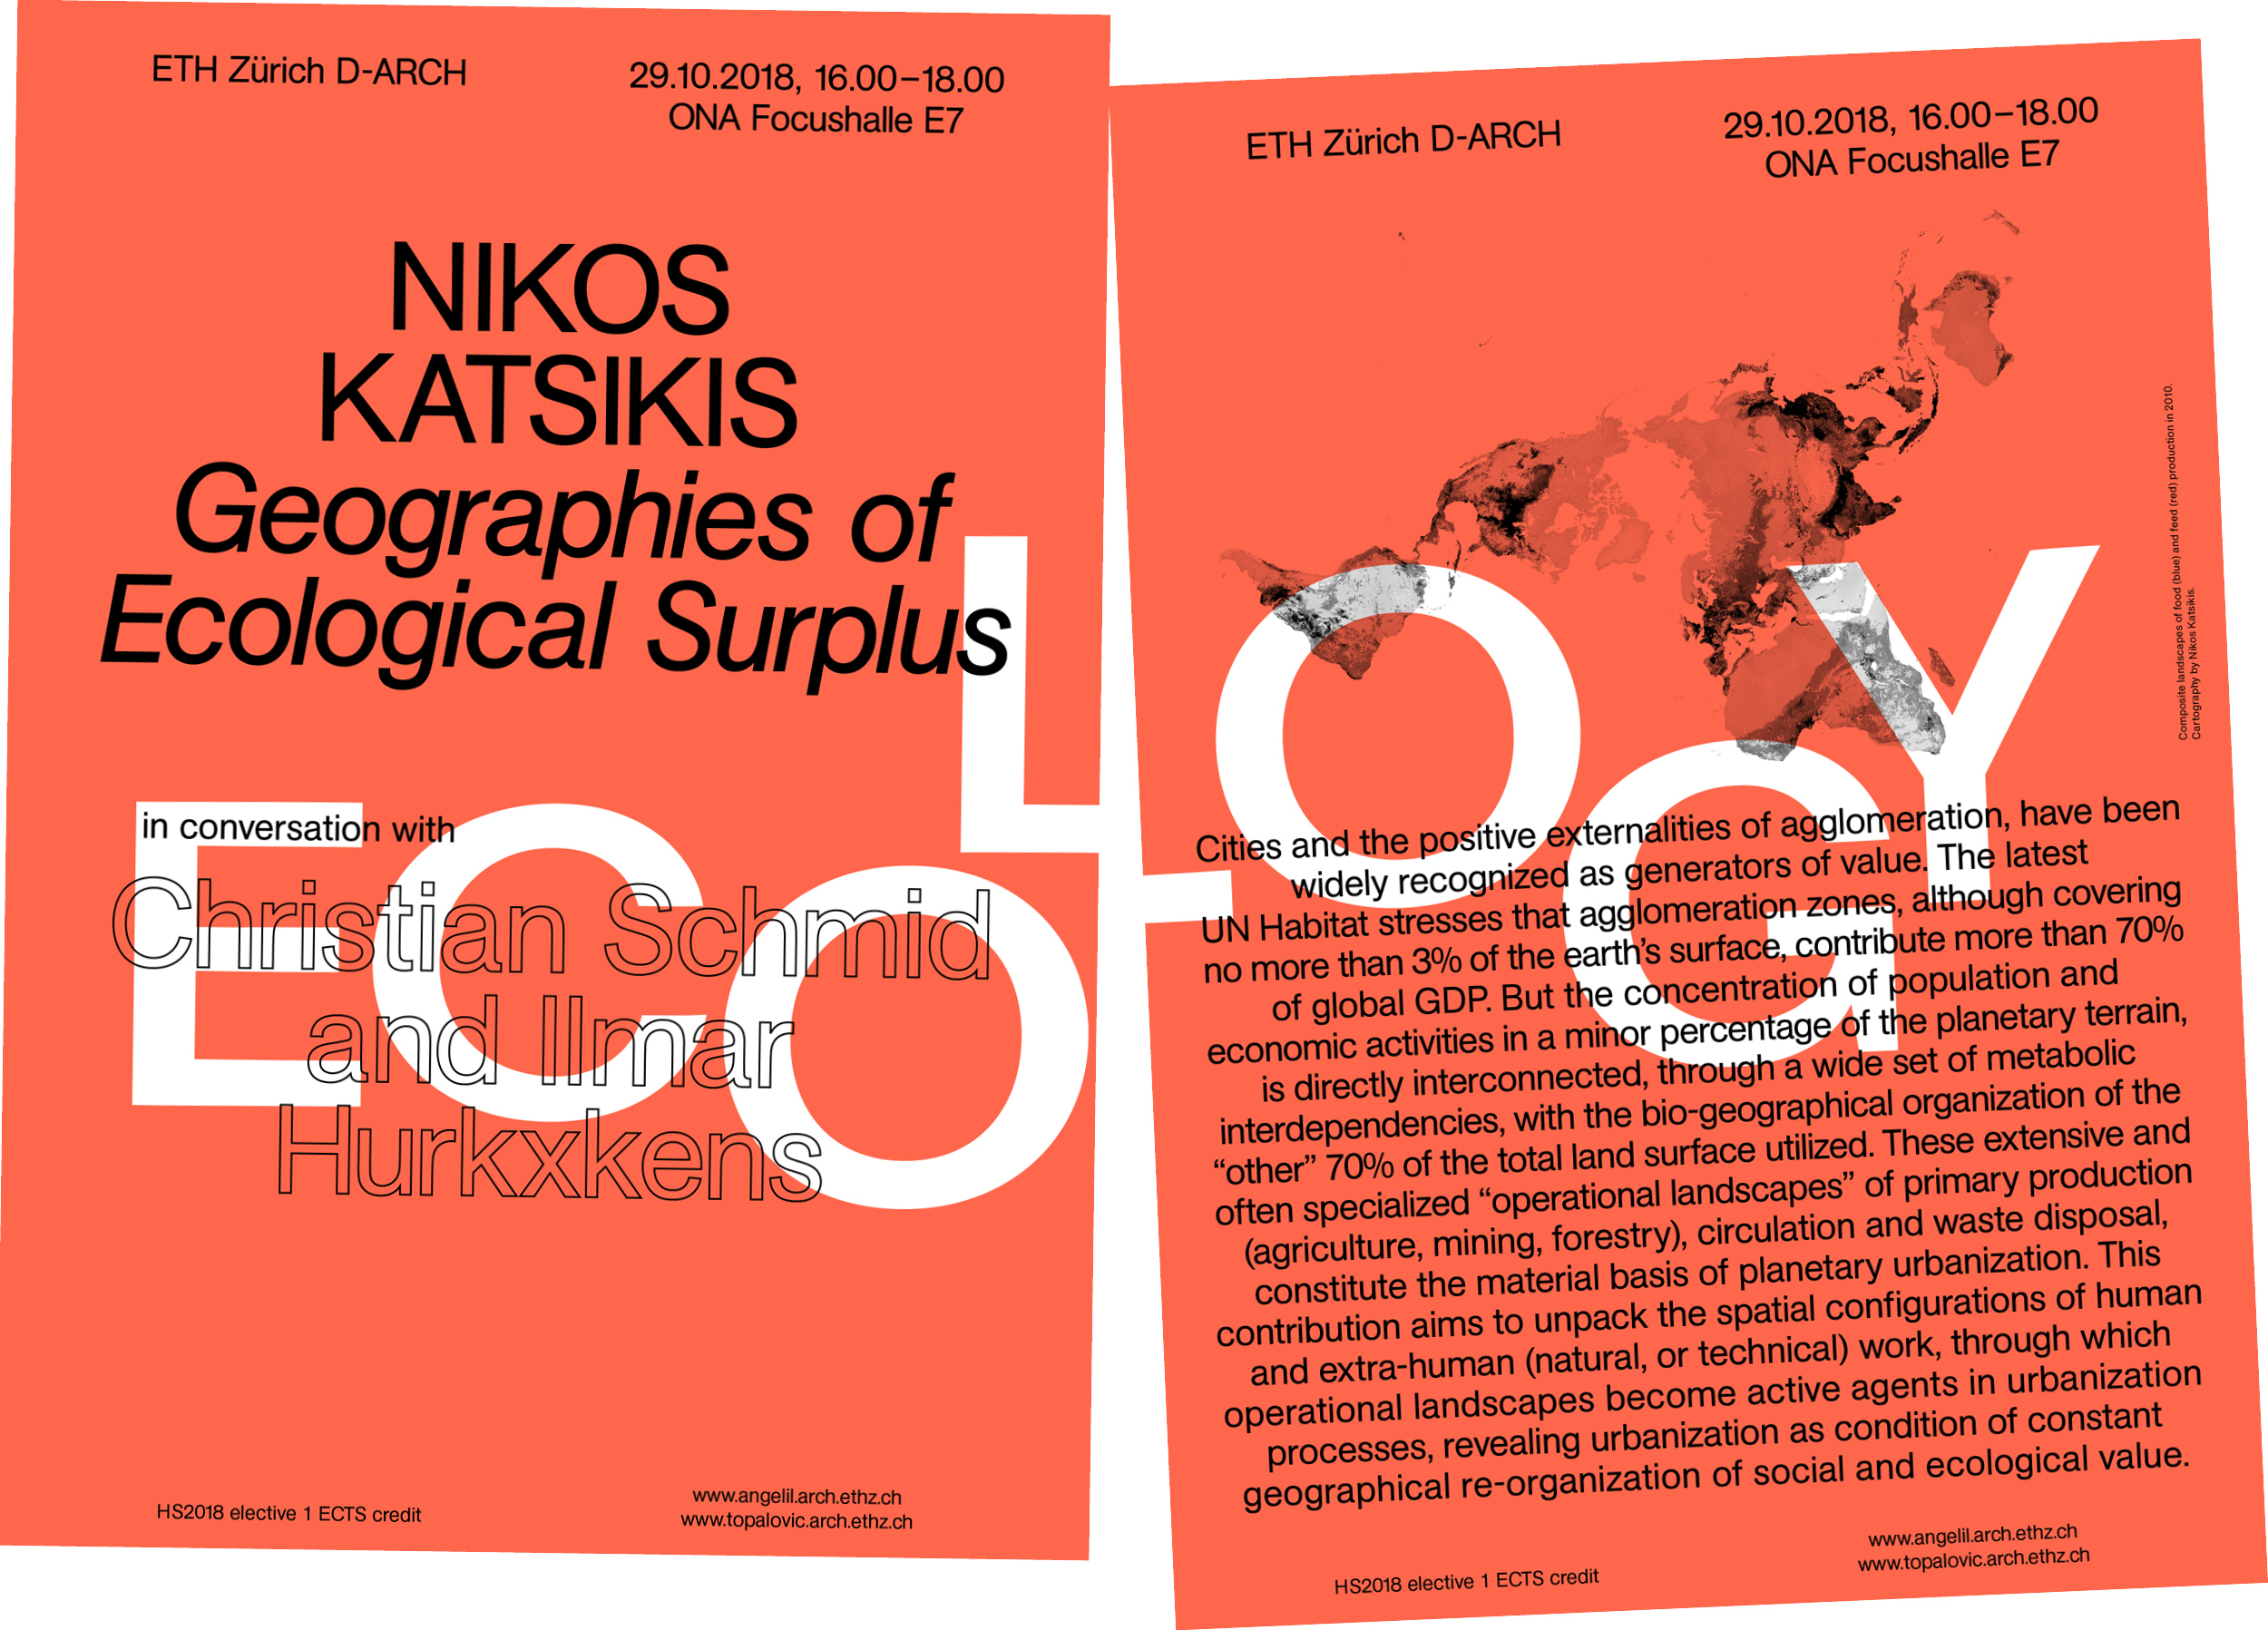 SOT HS18_LECTURE 03_Nikos Katsikis_Flyer WEB